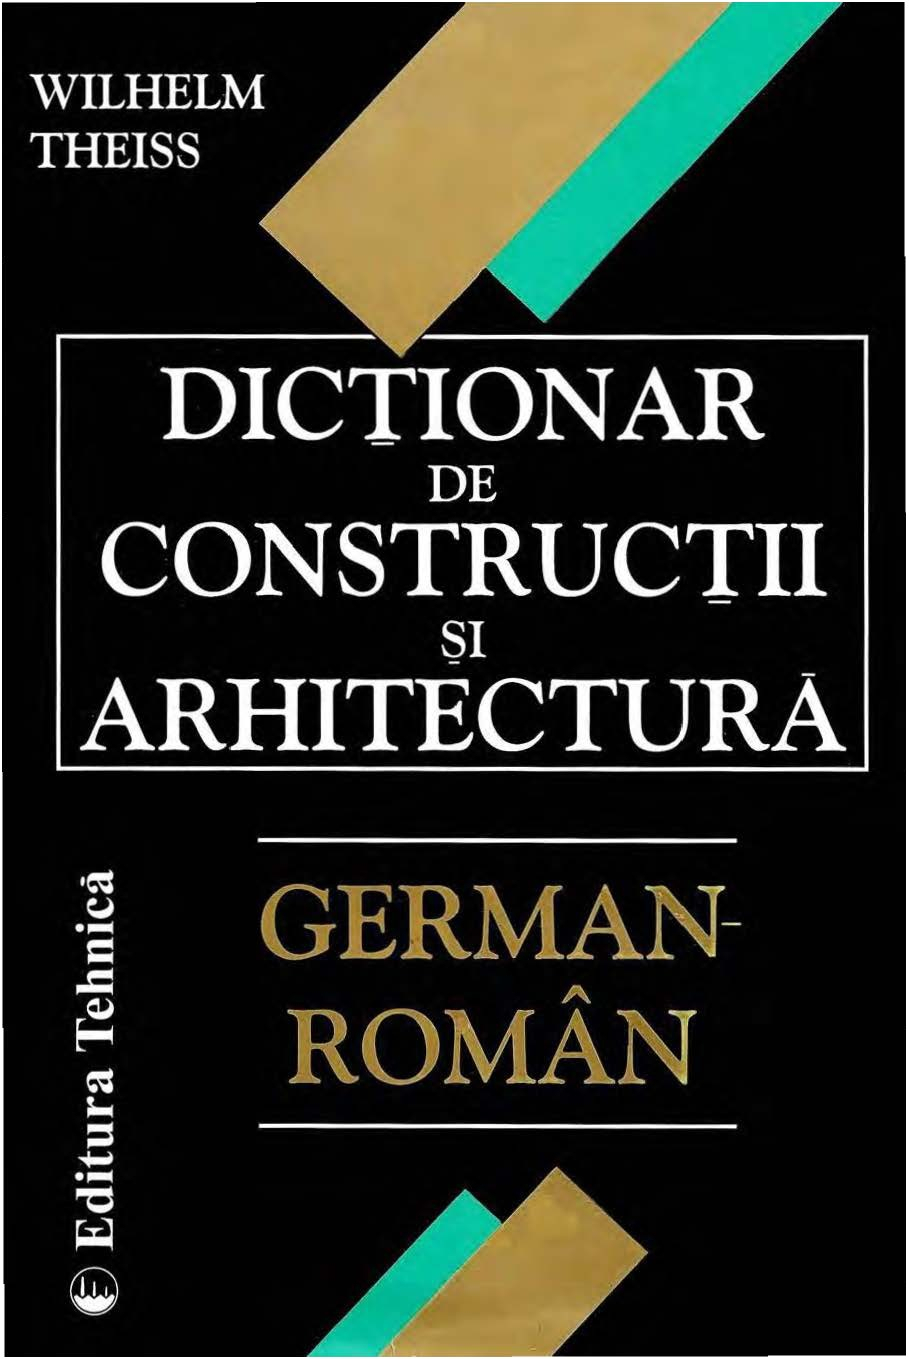 Dictionar De Constructii Si Arhitectura Dero [546G6R2R9Qn8] inside Calendar De Sanatate Si Frumusete